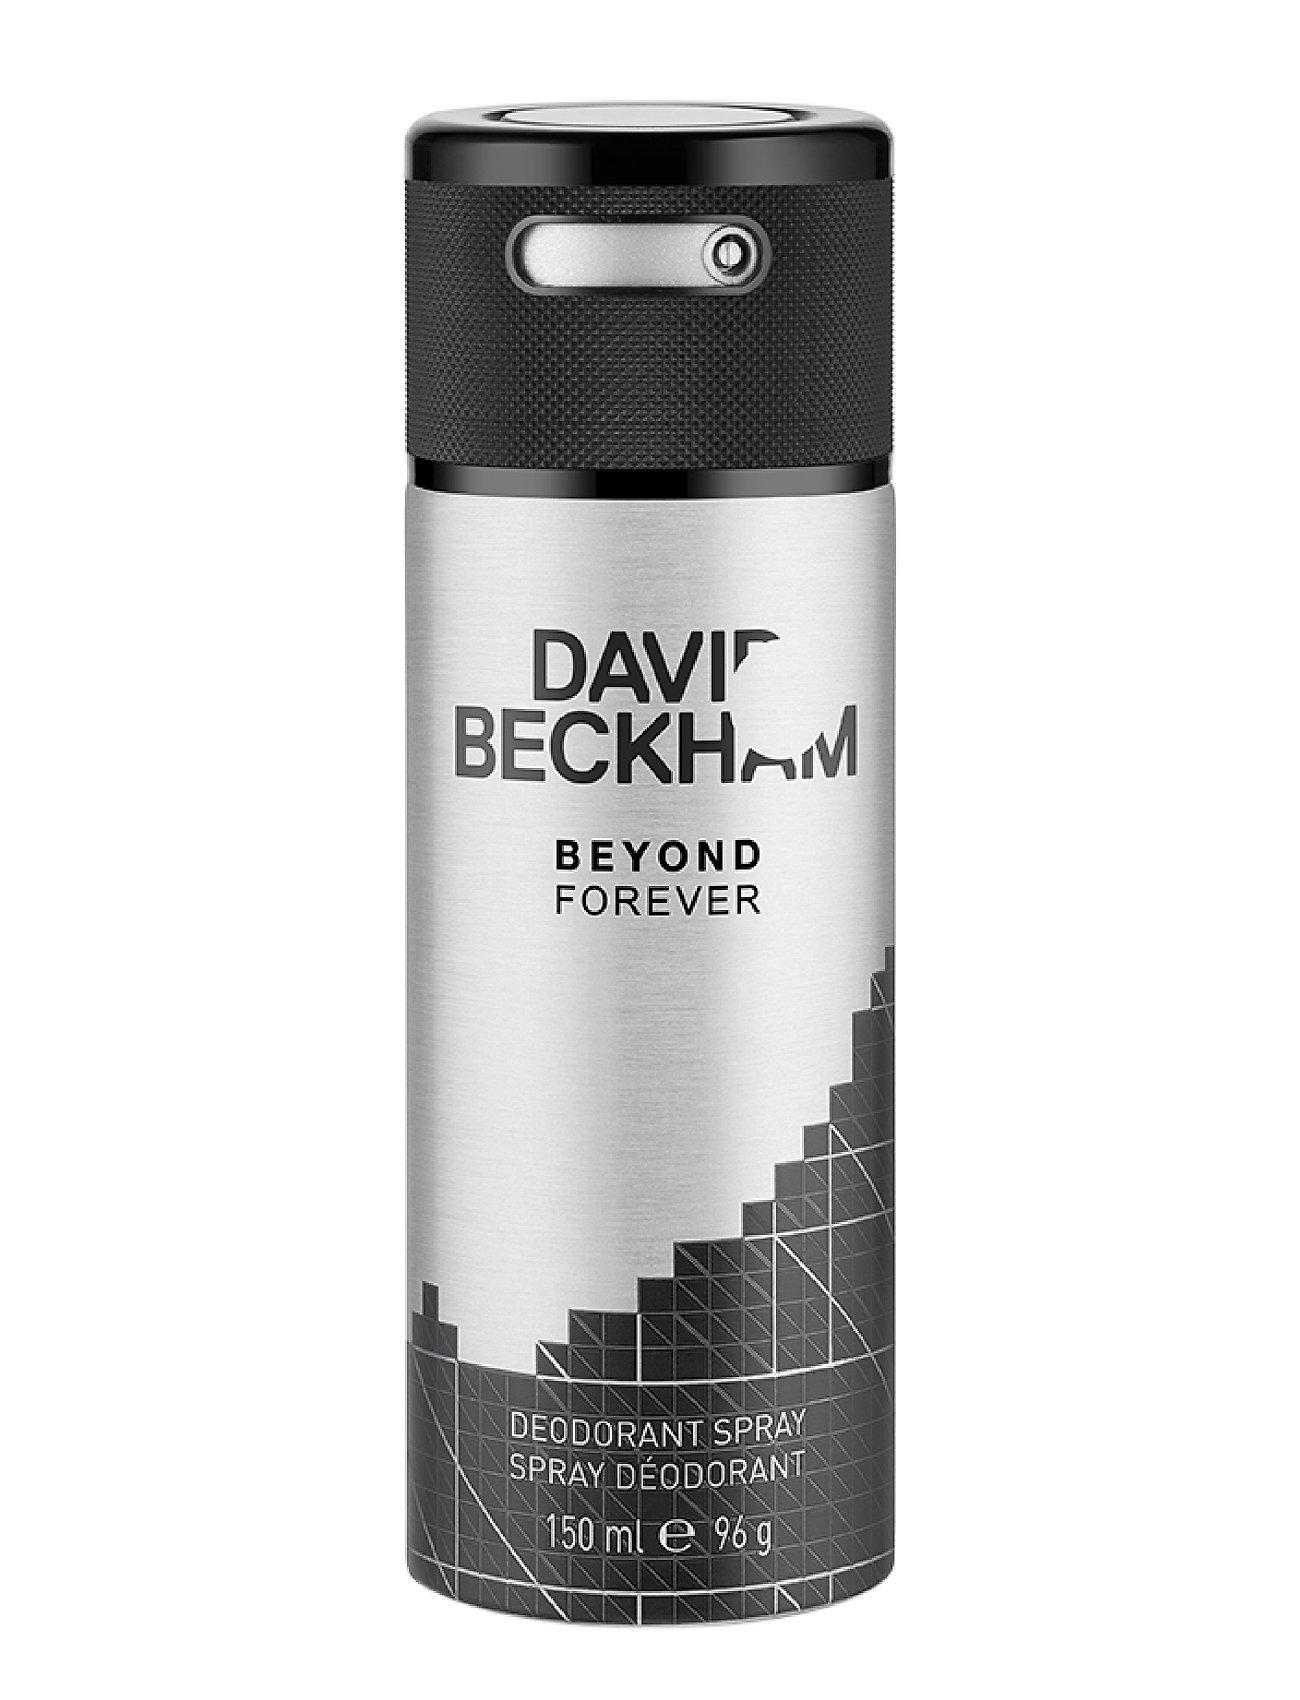 David beckham beyond forever deodor fra david beckham fra boozt.com dk